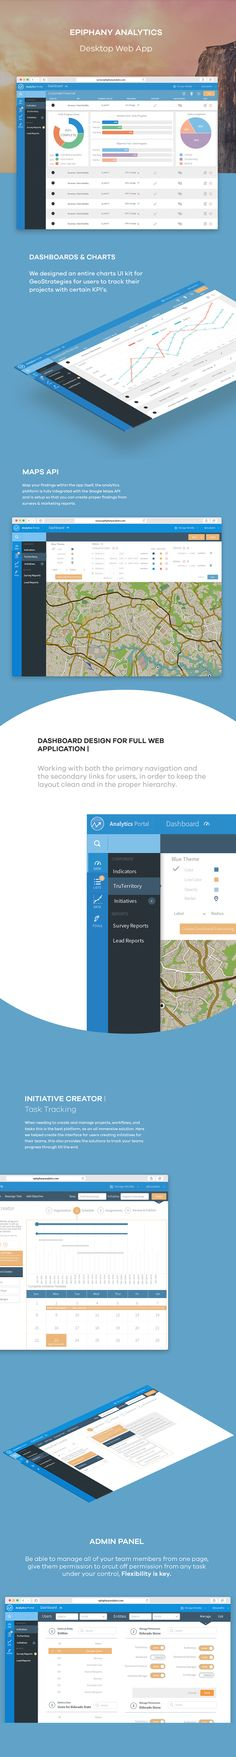 Analytics Web App - Dashboard, charts, initiatives, maps, google api and everything else.